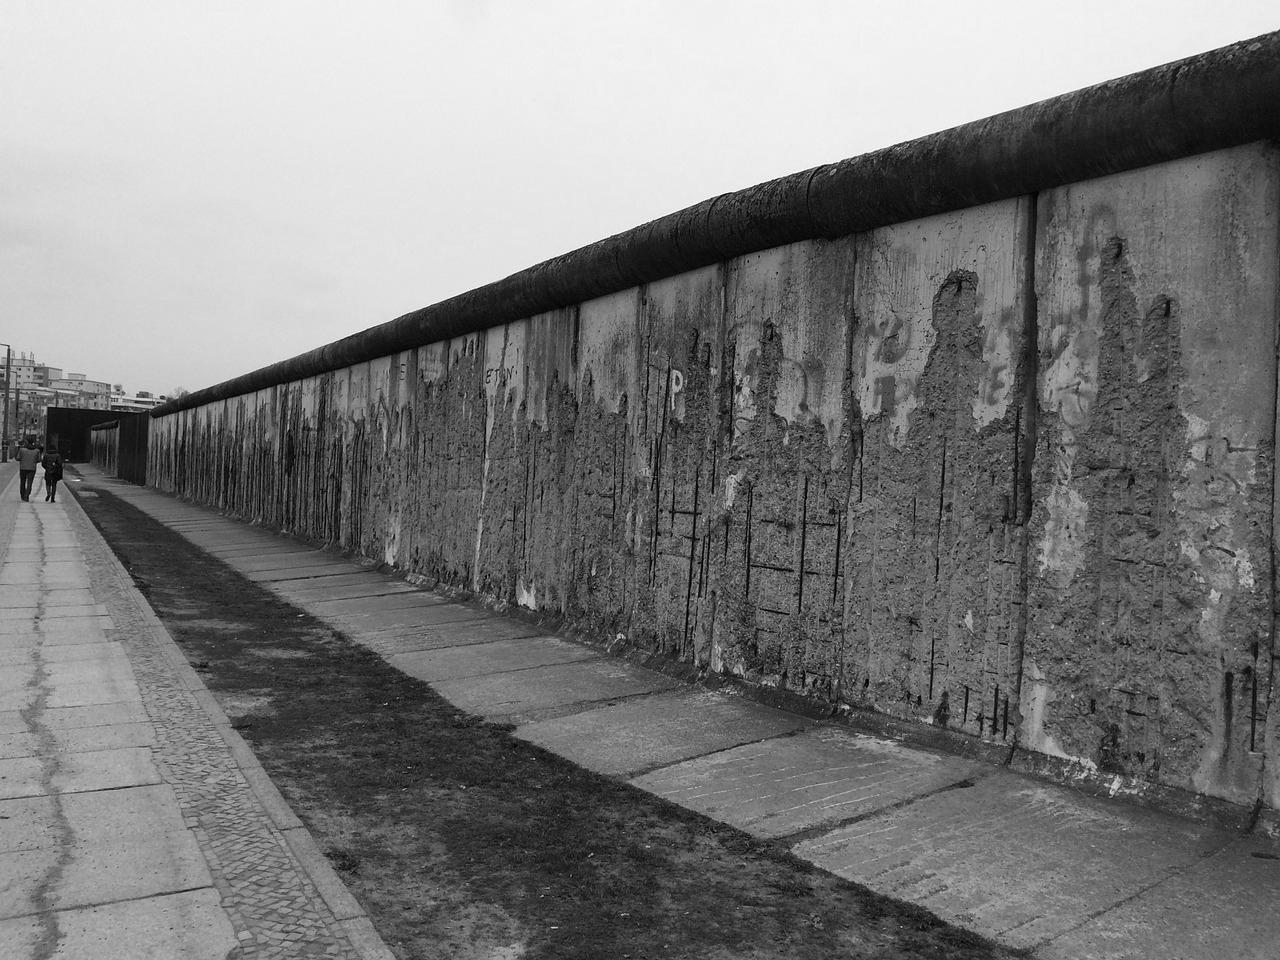 Infographic / Text: Innerdeutsche Grenze / The GDR's border in Numbers